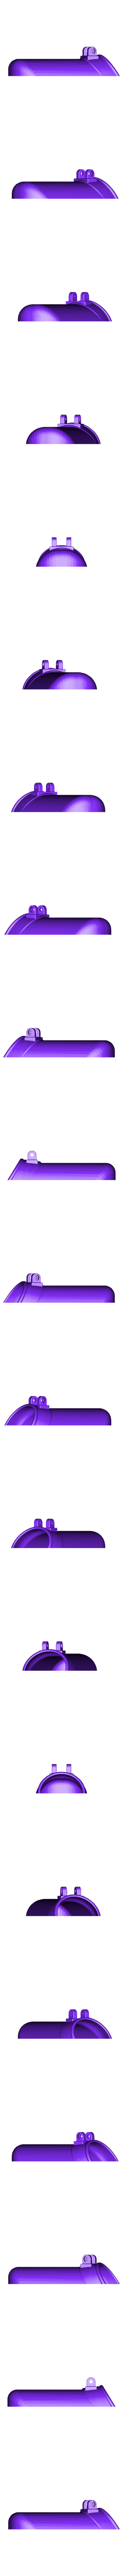 winchester hopper Body TOP.STL Download STL file 50 rounds Winchester Hopper • 3D printable object, DjeKlein